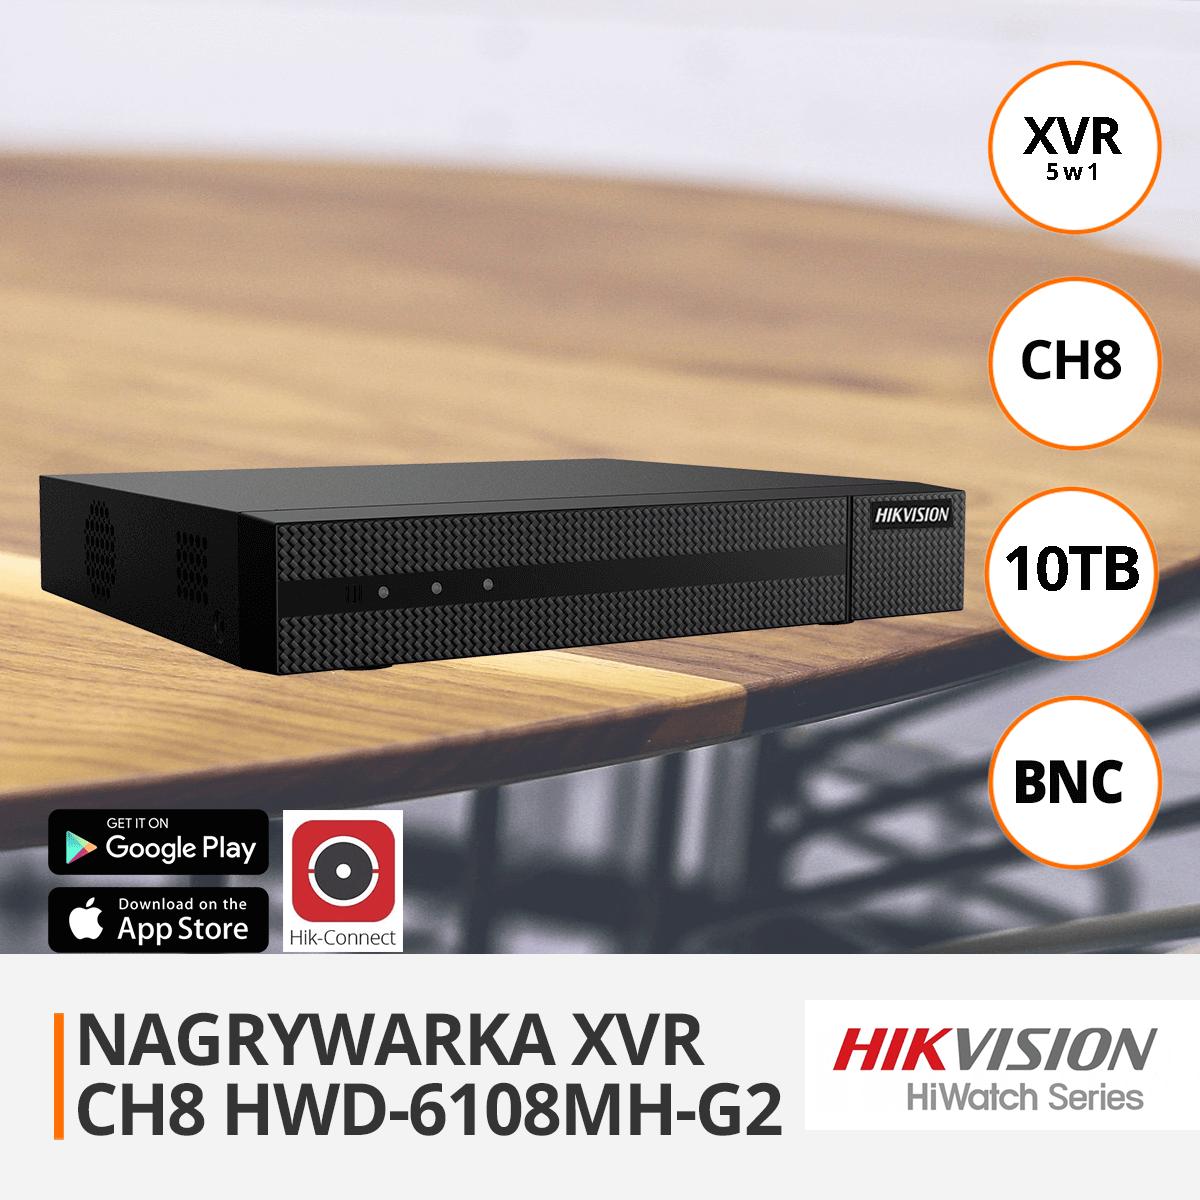 Nagrywarka xvr hikivision funkcje orllo.pl